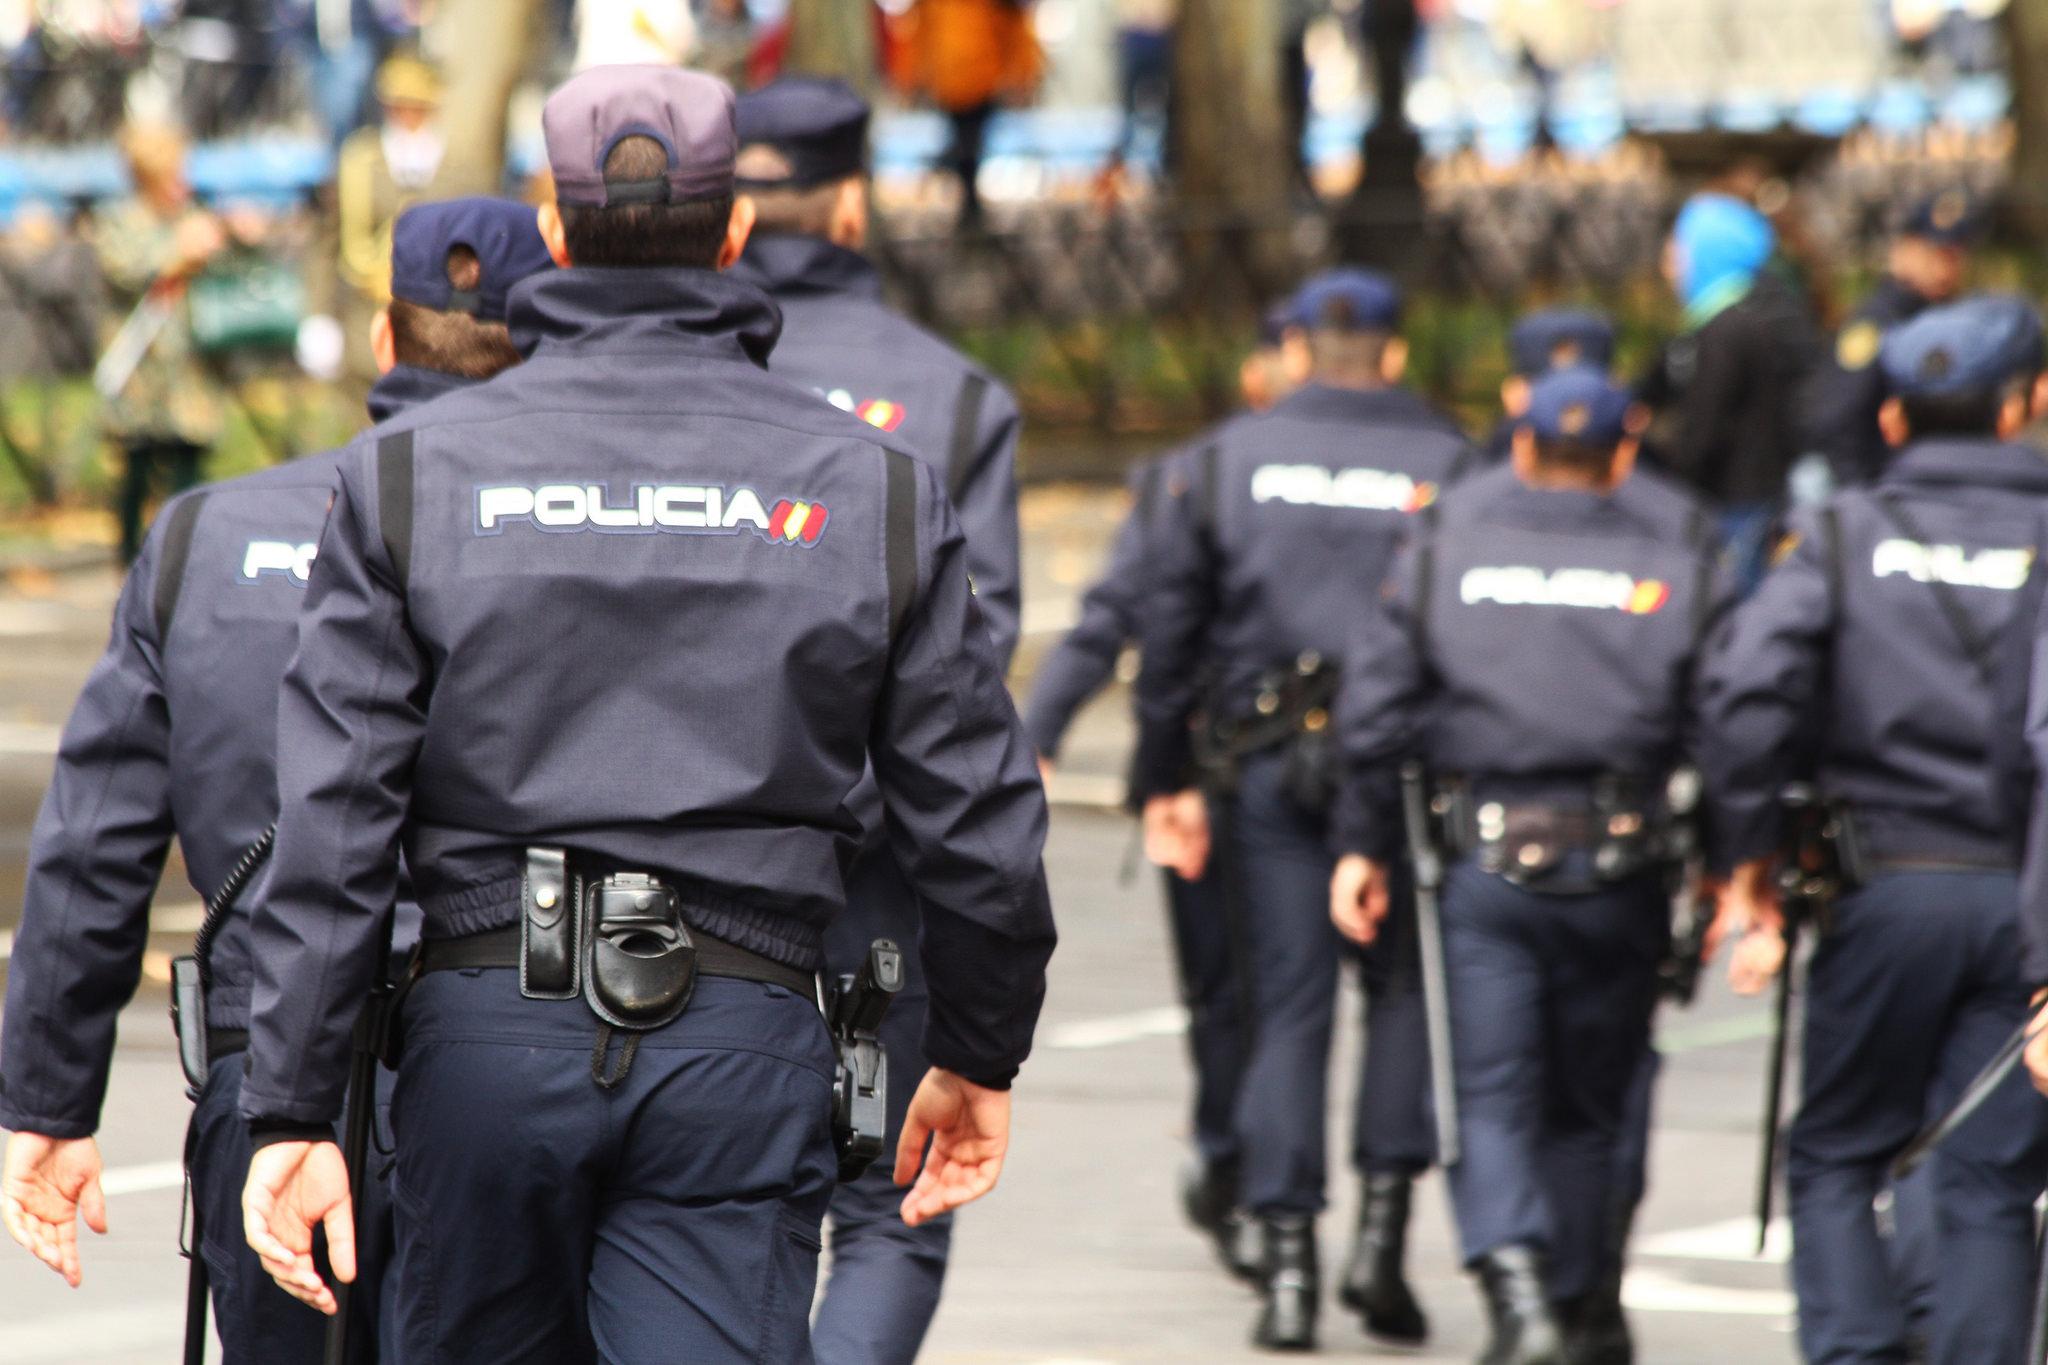 distribuidores de material policial